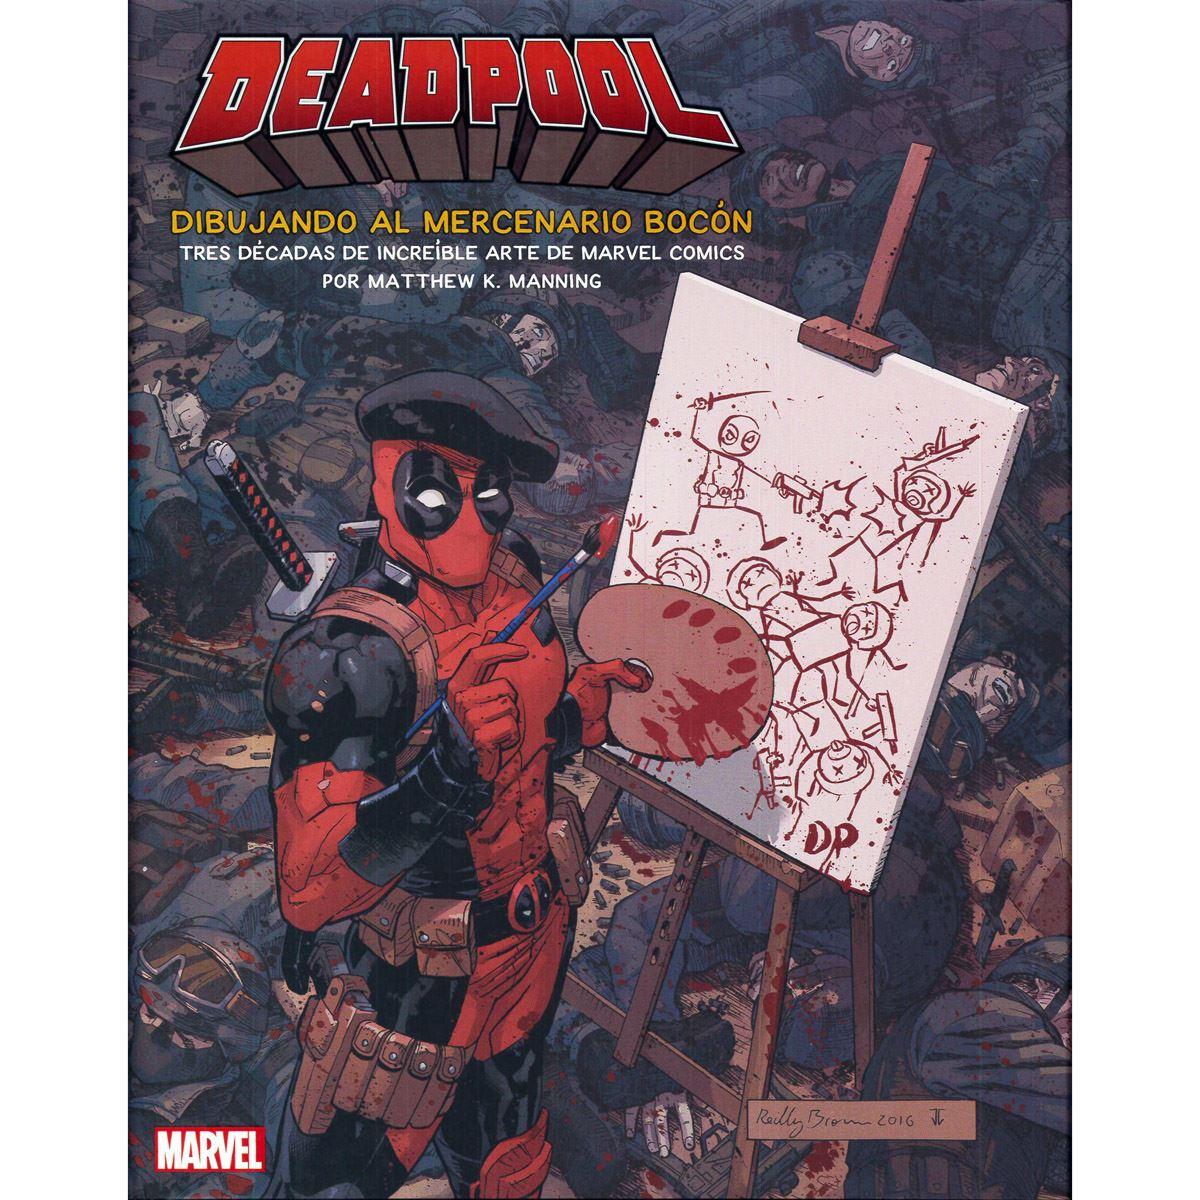 Deadpool dibujando al mercenario bocón